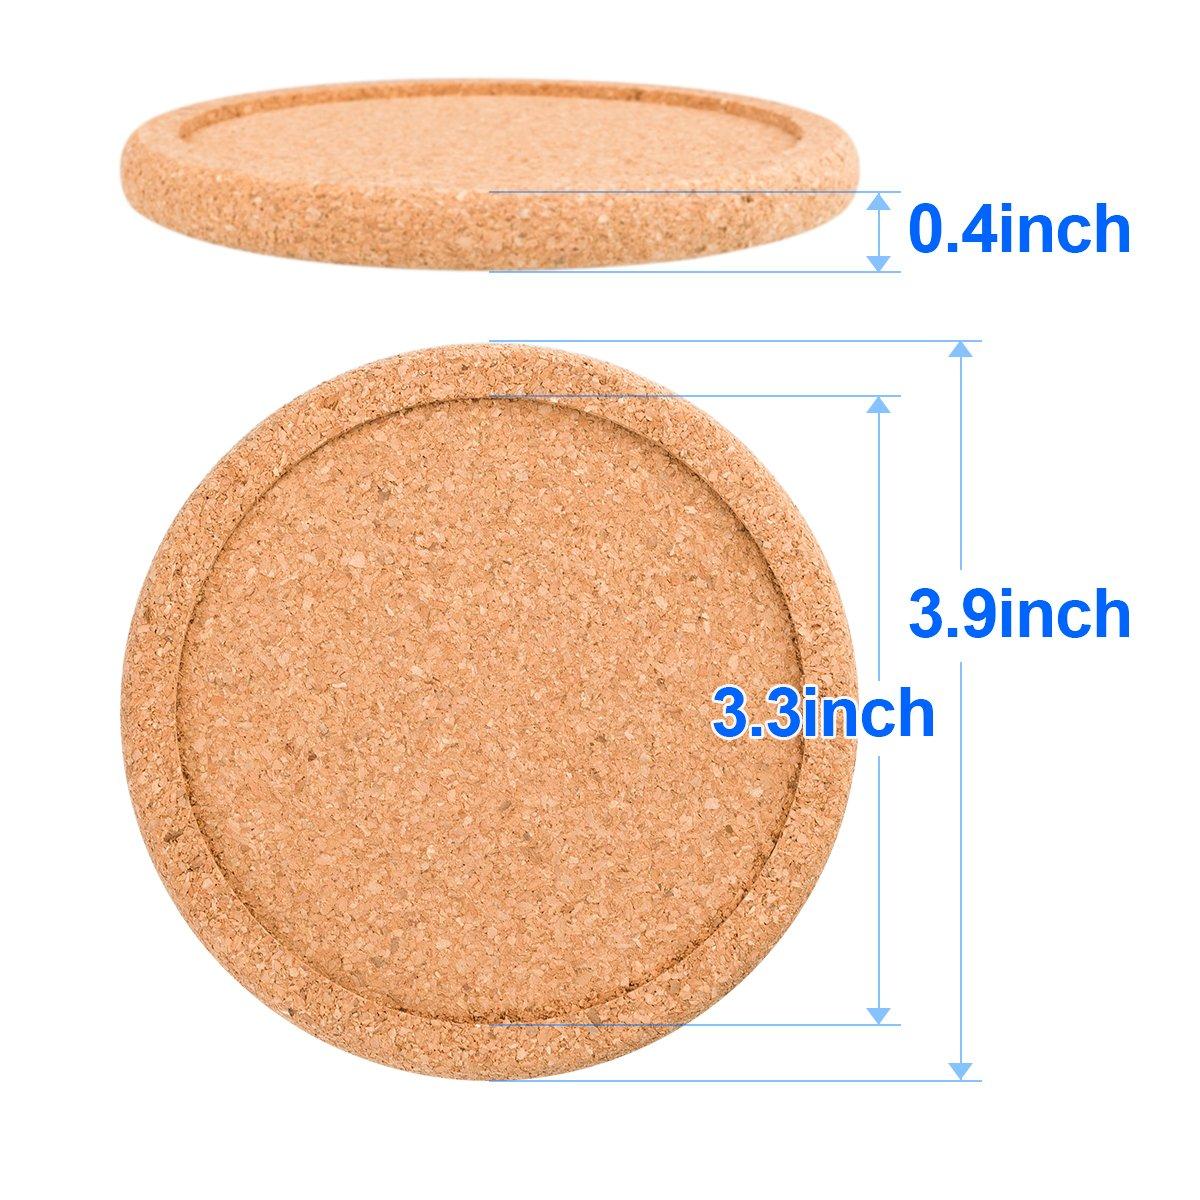 Cork Coasters For Drinks Absorbent Set 10 PCS 3.9 Diameter